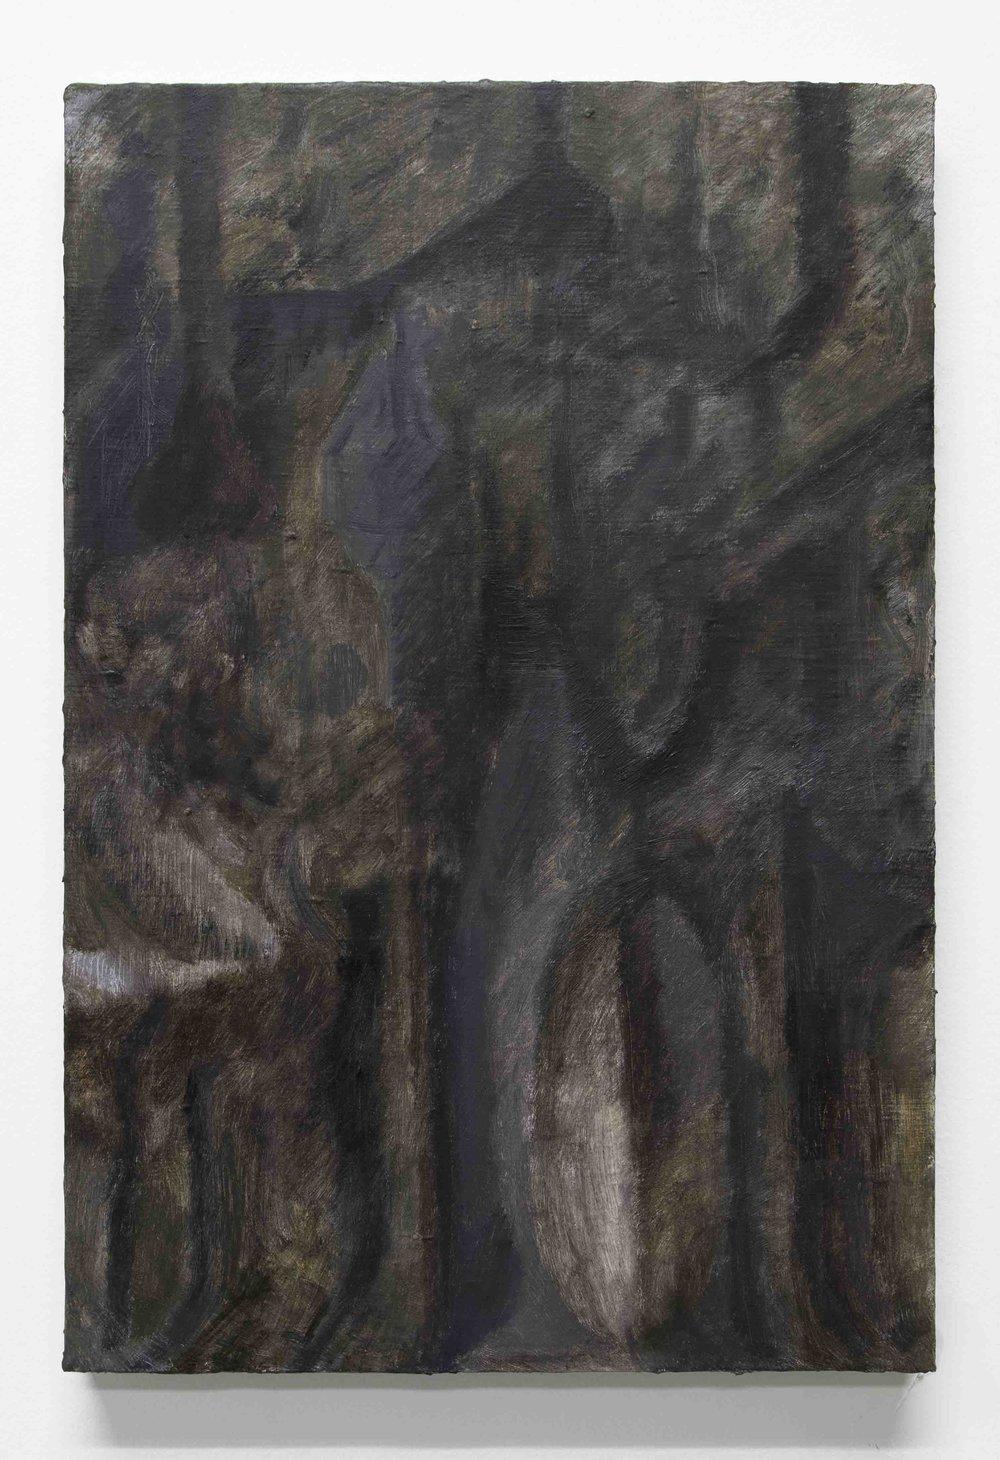 Tim Bučković, Atelier, 2017, oil on linen, 46 x 30.5 cm